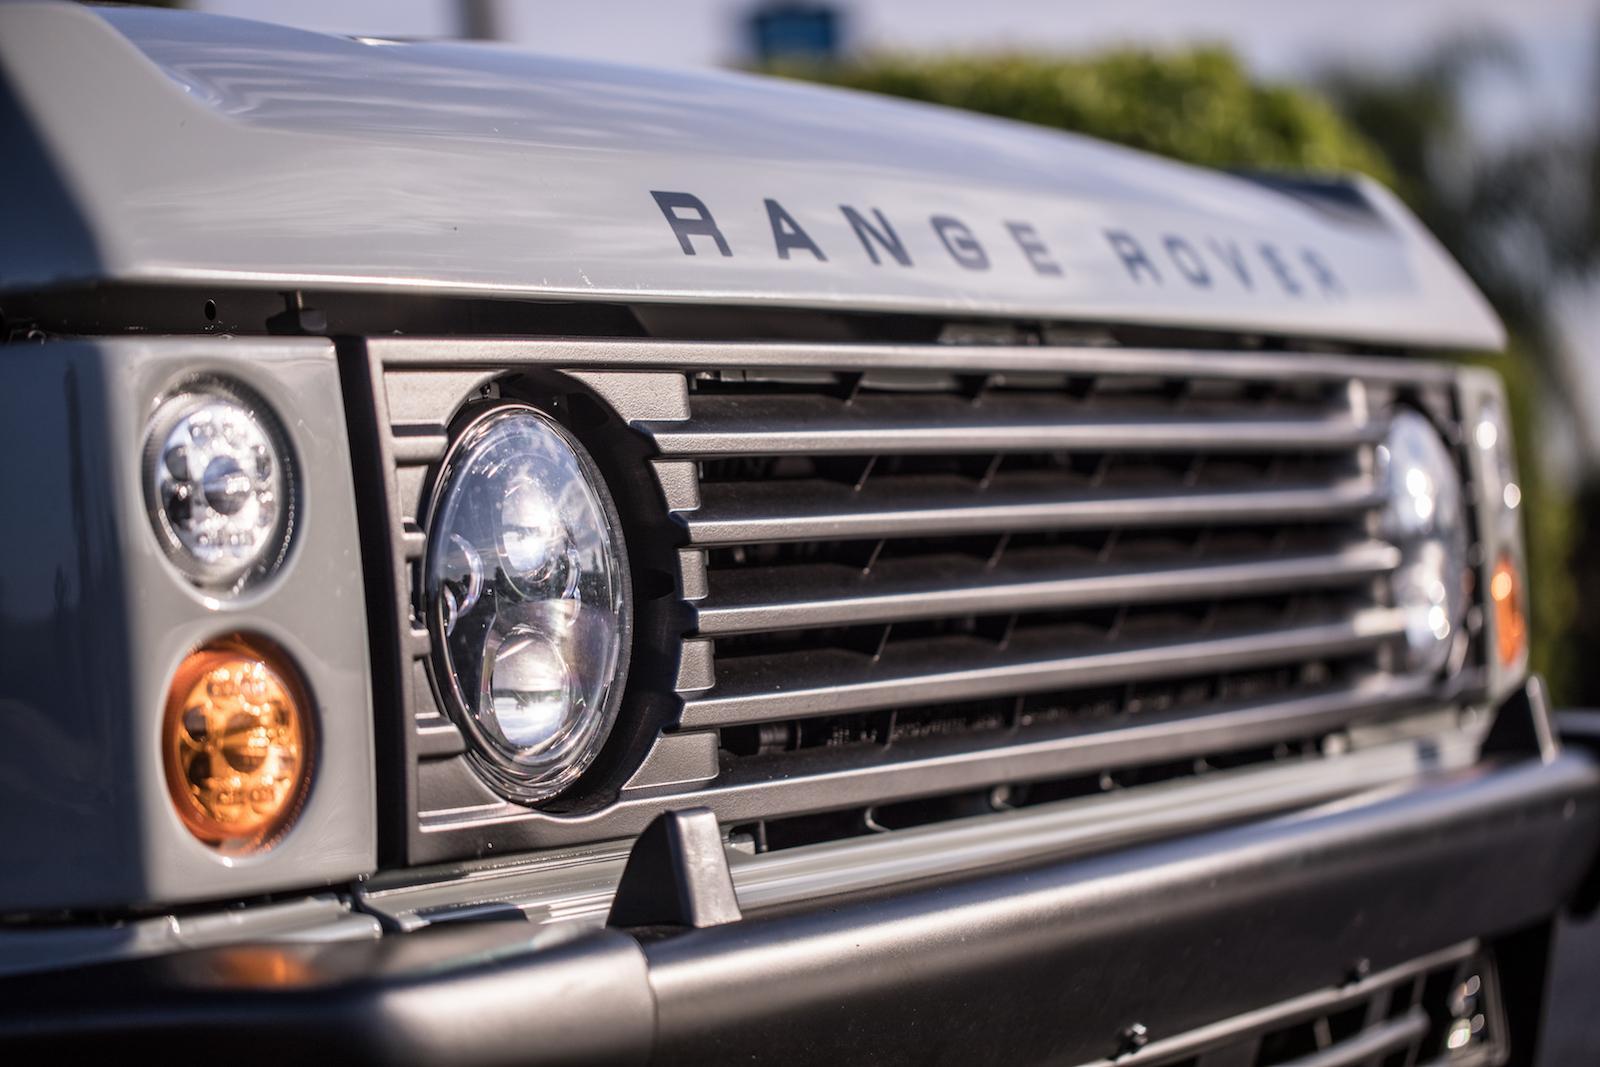 Range Rover Classic Restomod 7 - Restomods com